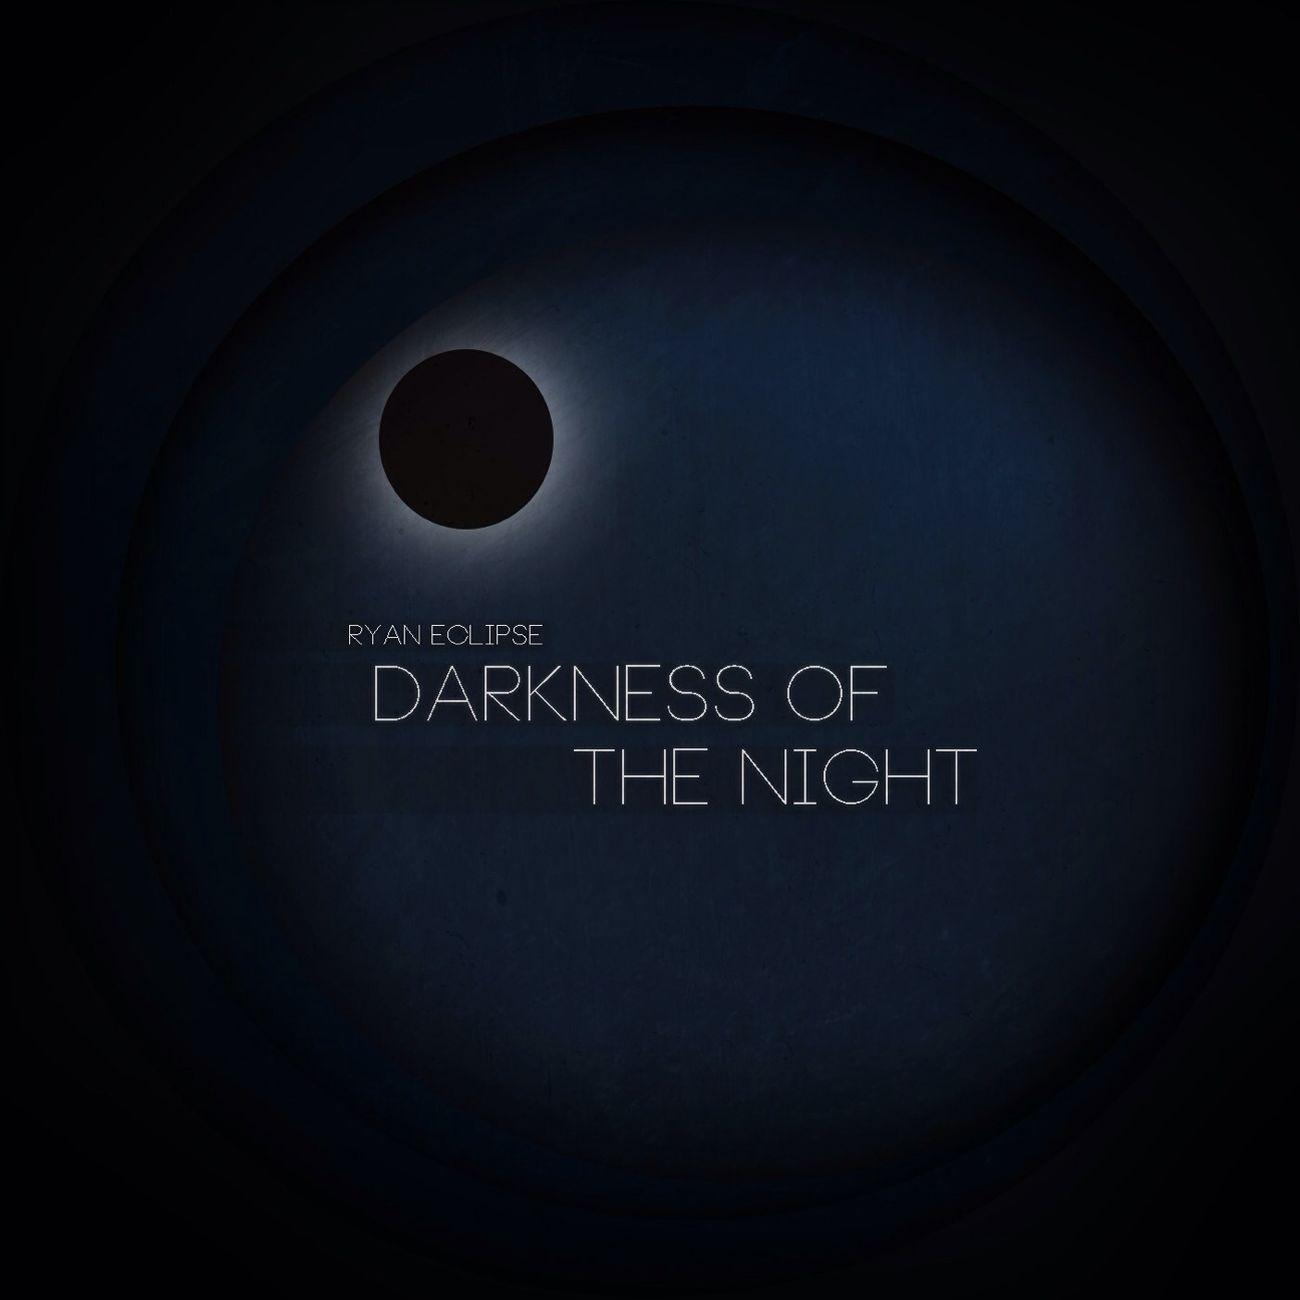 Album Cover For Eclipse